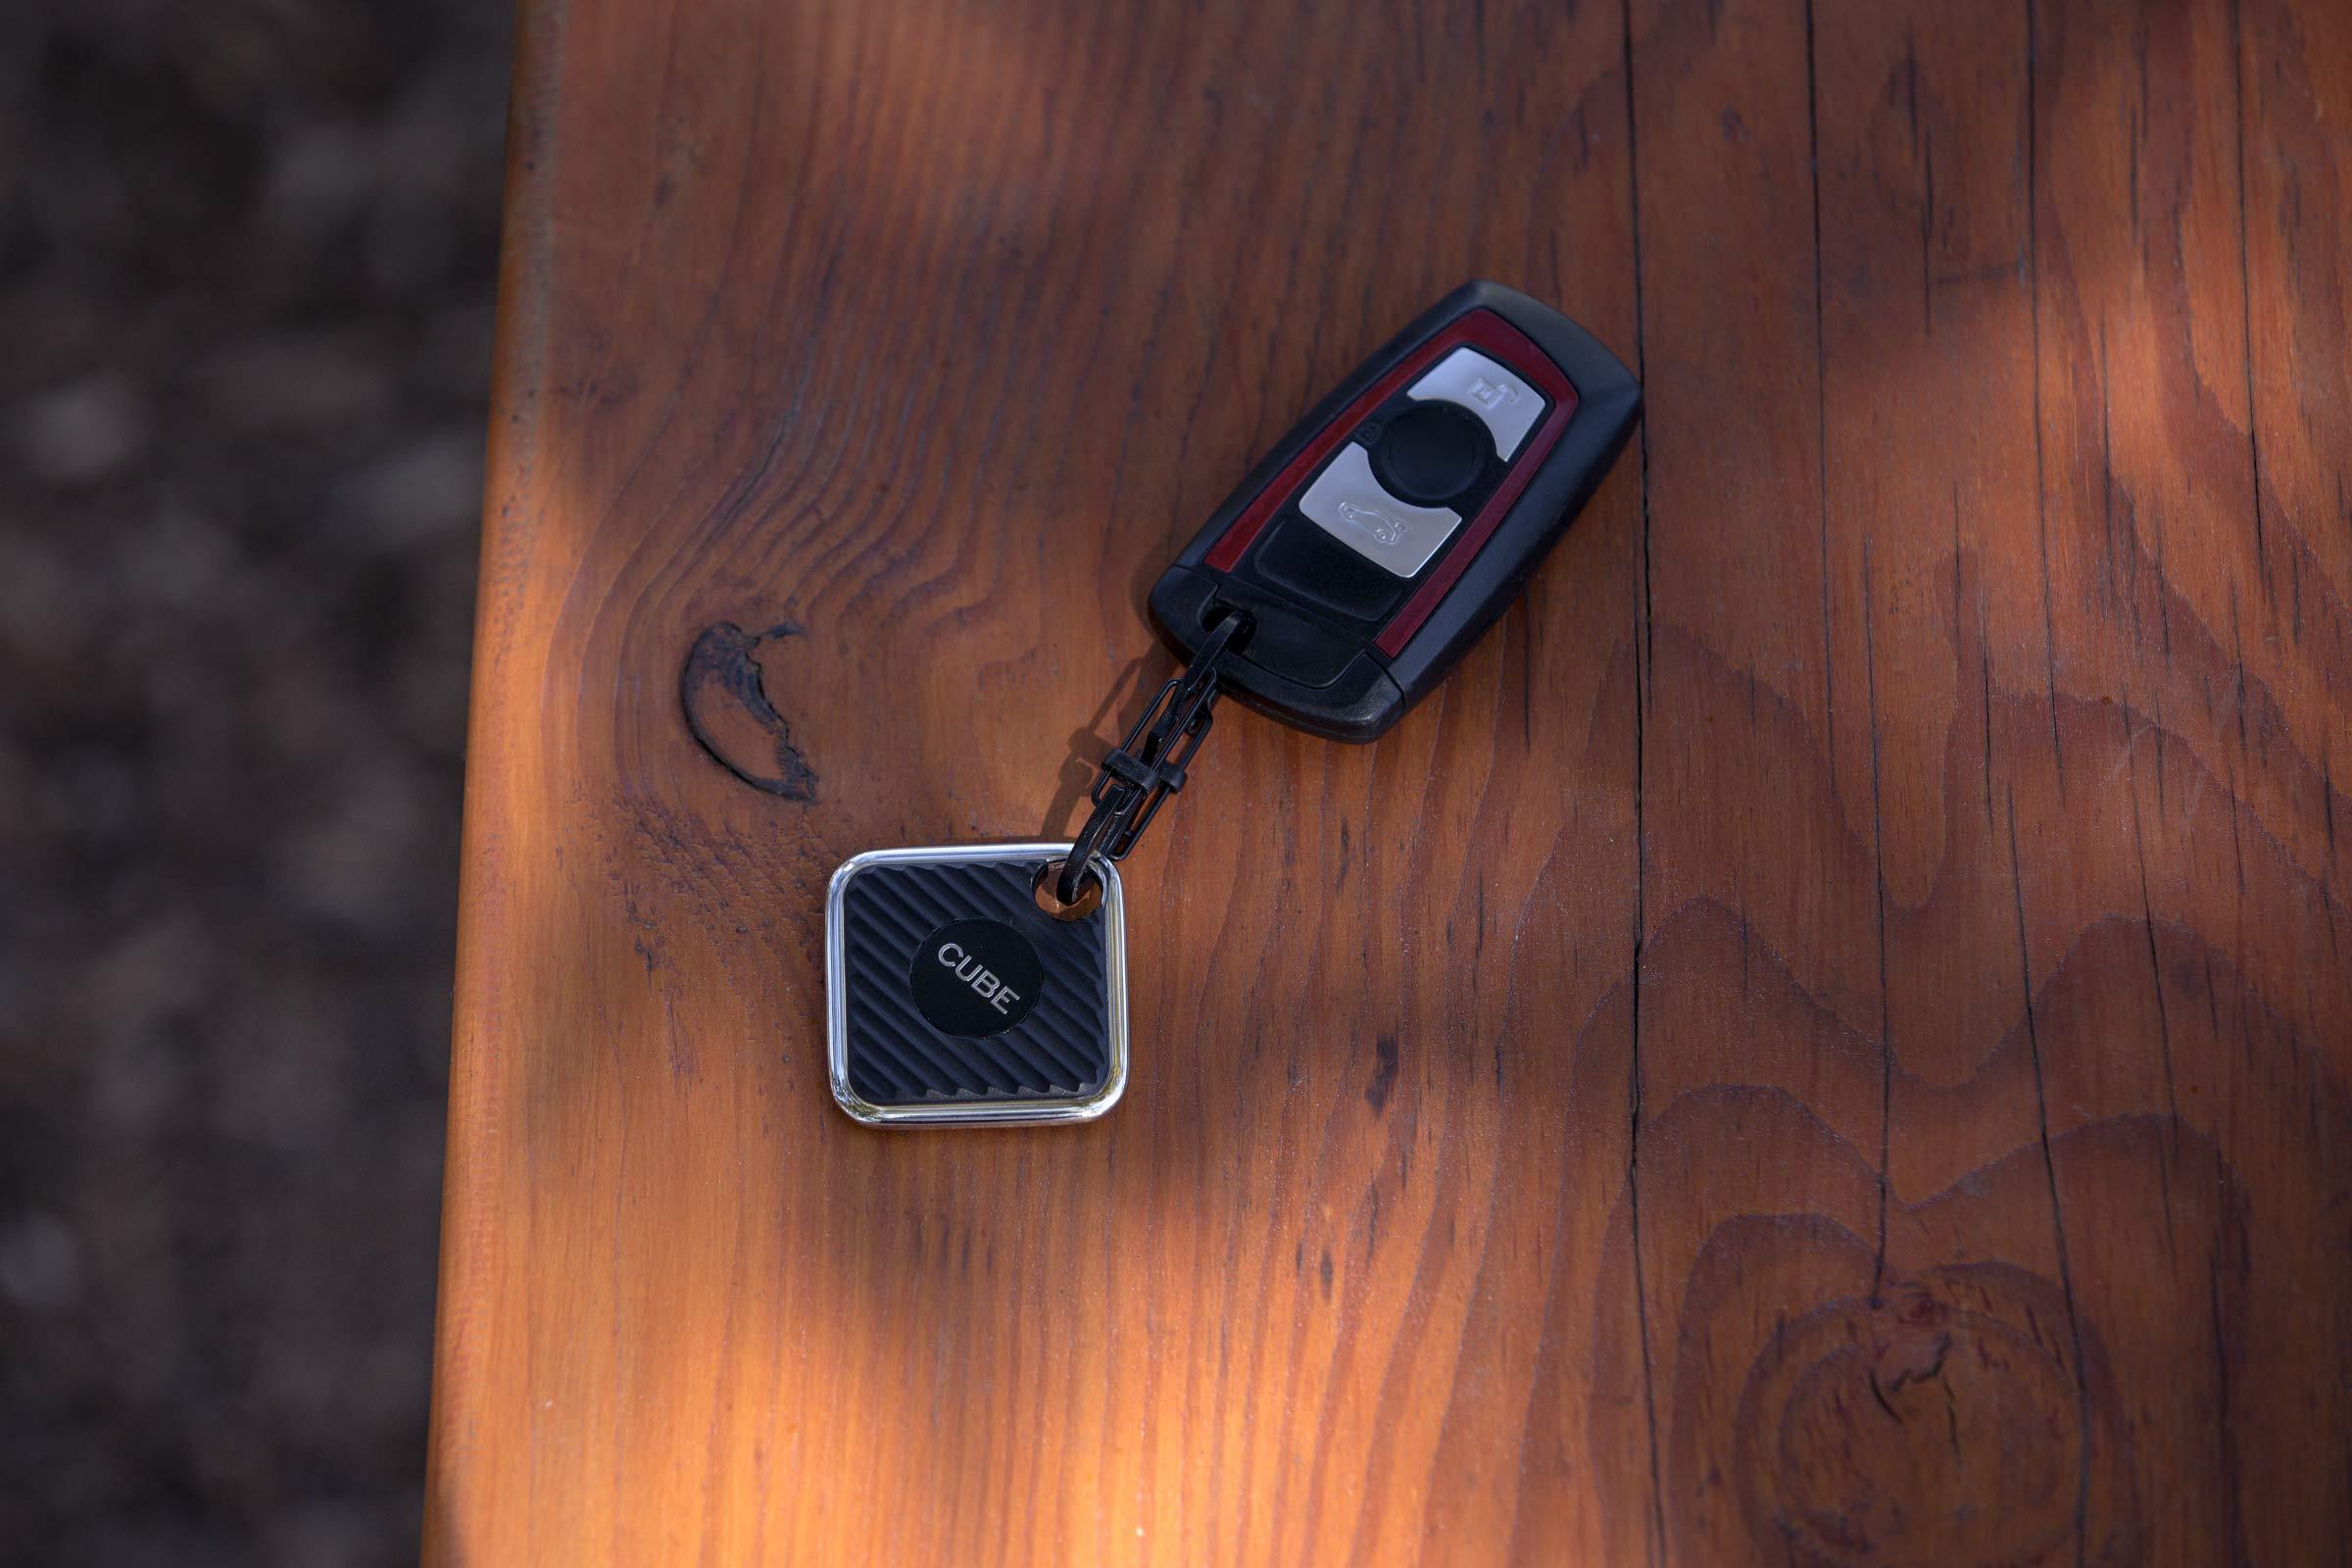 Cube Pro Key Finder Smart Tracker Bluetooth GPS Tracker ...